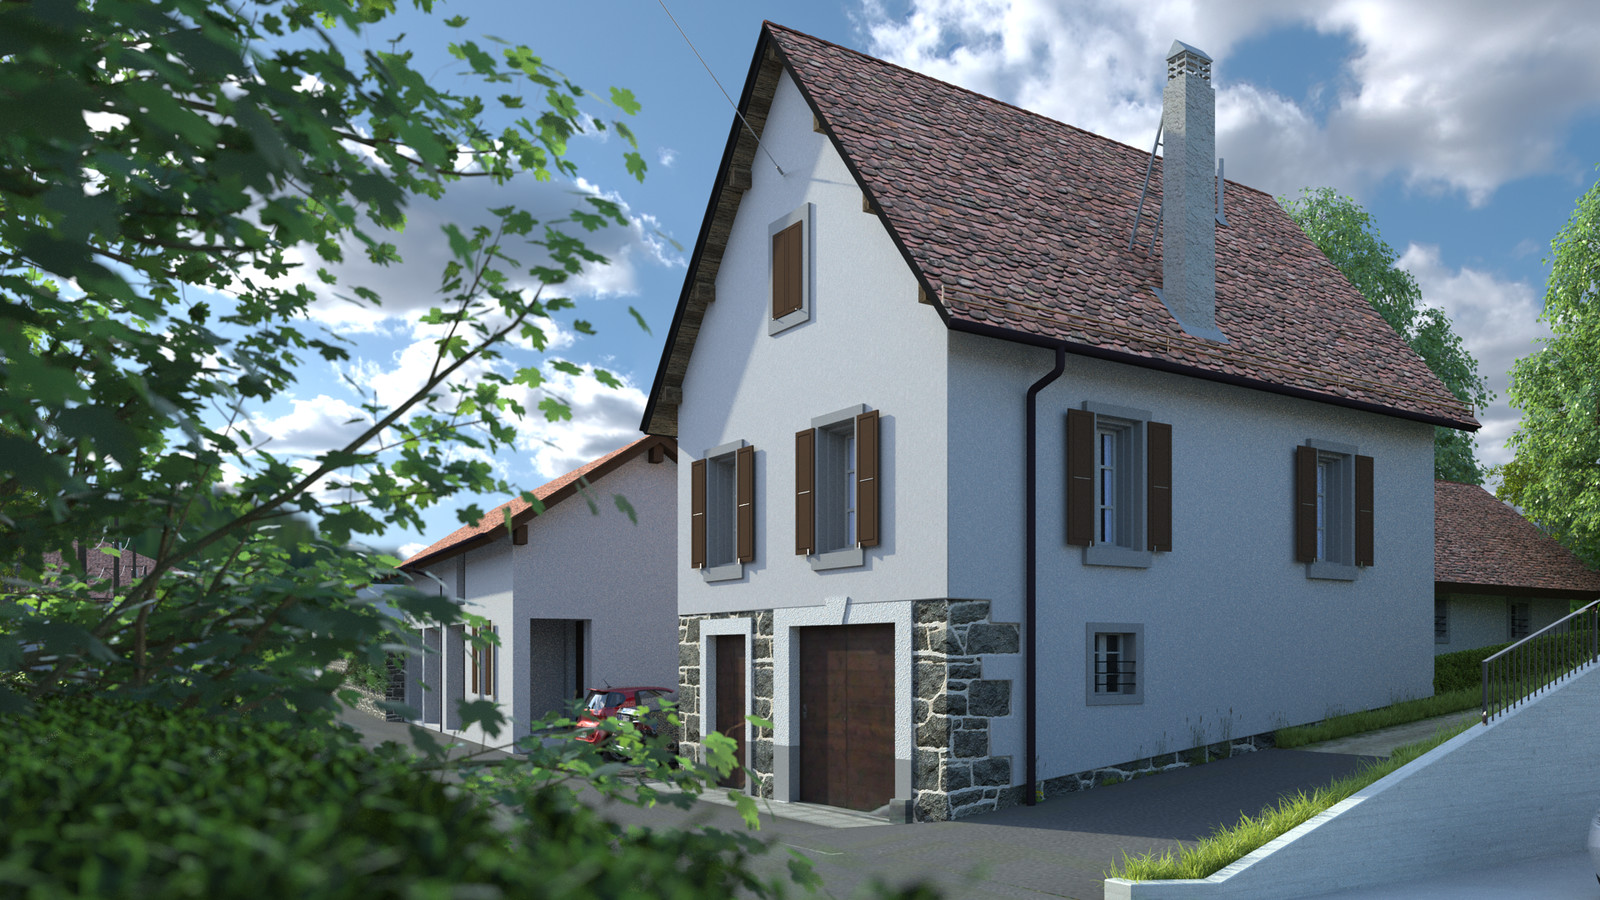 SketchUp + Thea Render  Little Swiss House Scene 28 162-hdri-skies 01 HD 1920 x 1080 Presto MC  HDR by HDRI-SKIES found here: http://hdri-skies.com/shop/hdri-sky-162/